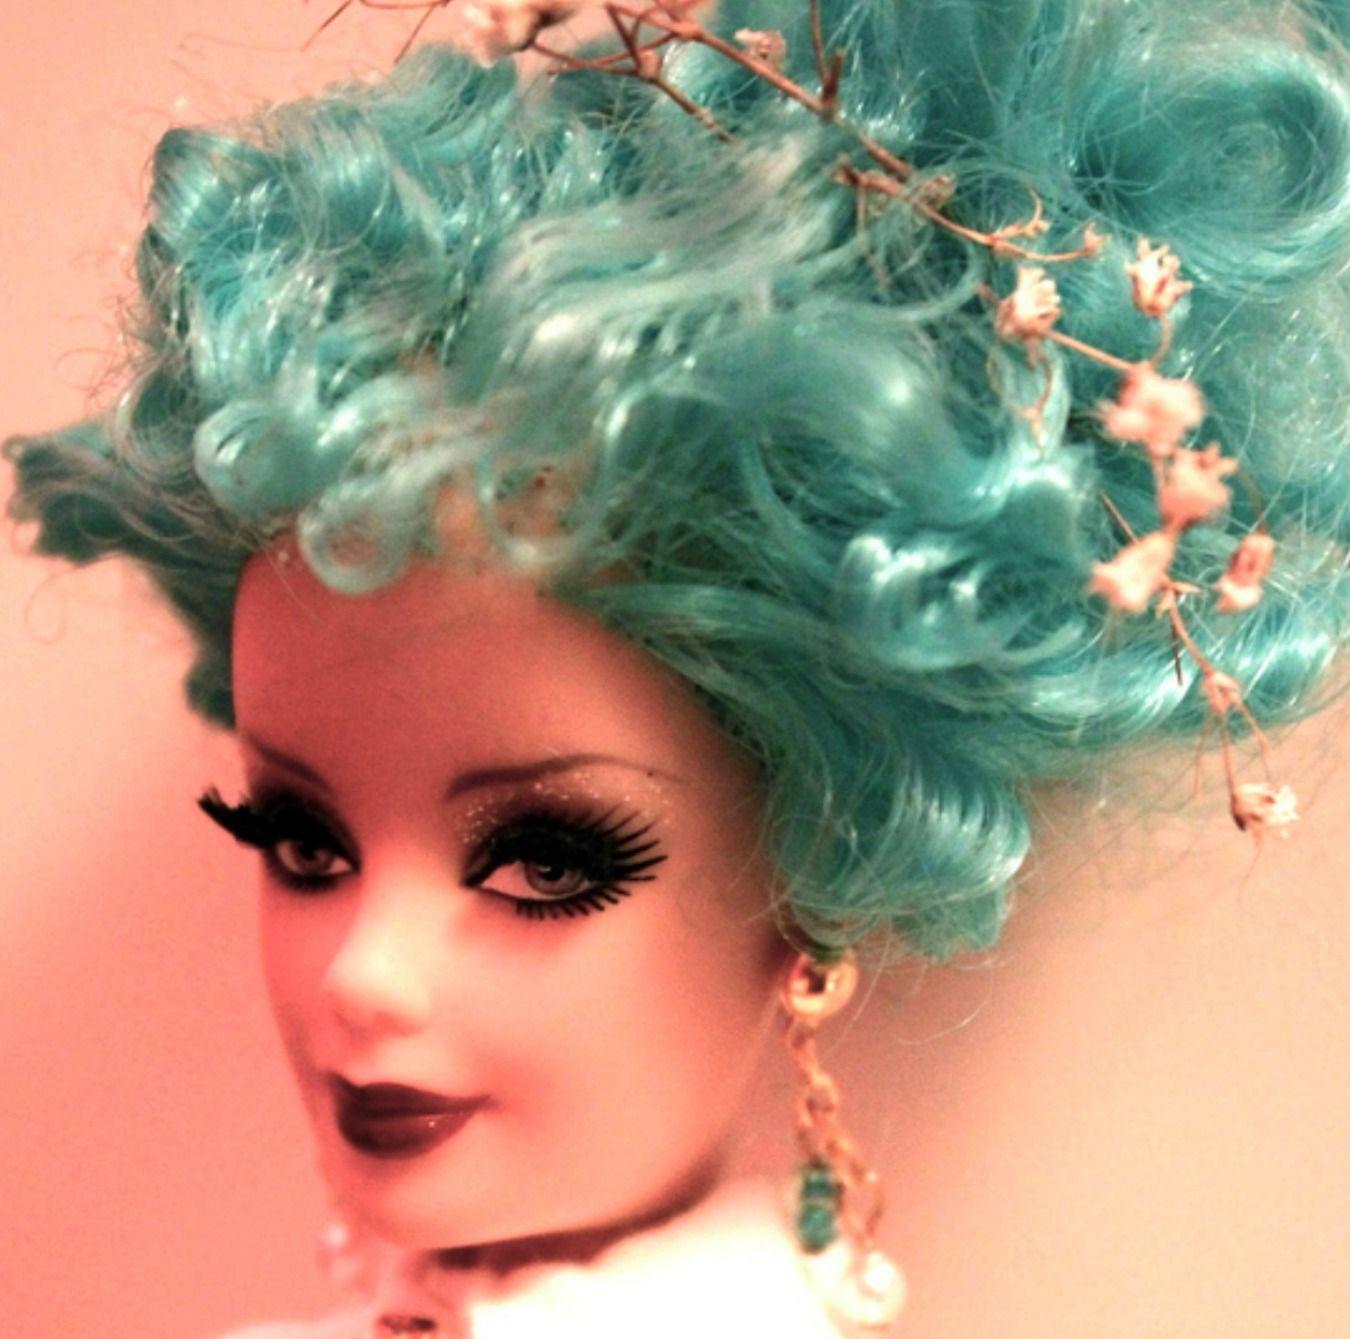 Pin de Fantasy en Dolls   Muñecas barbie, Maquillaje